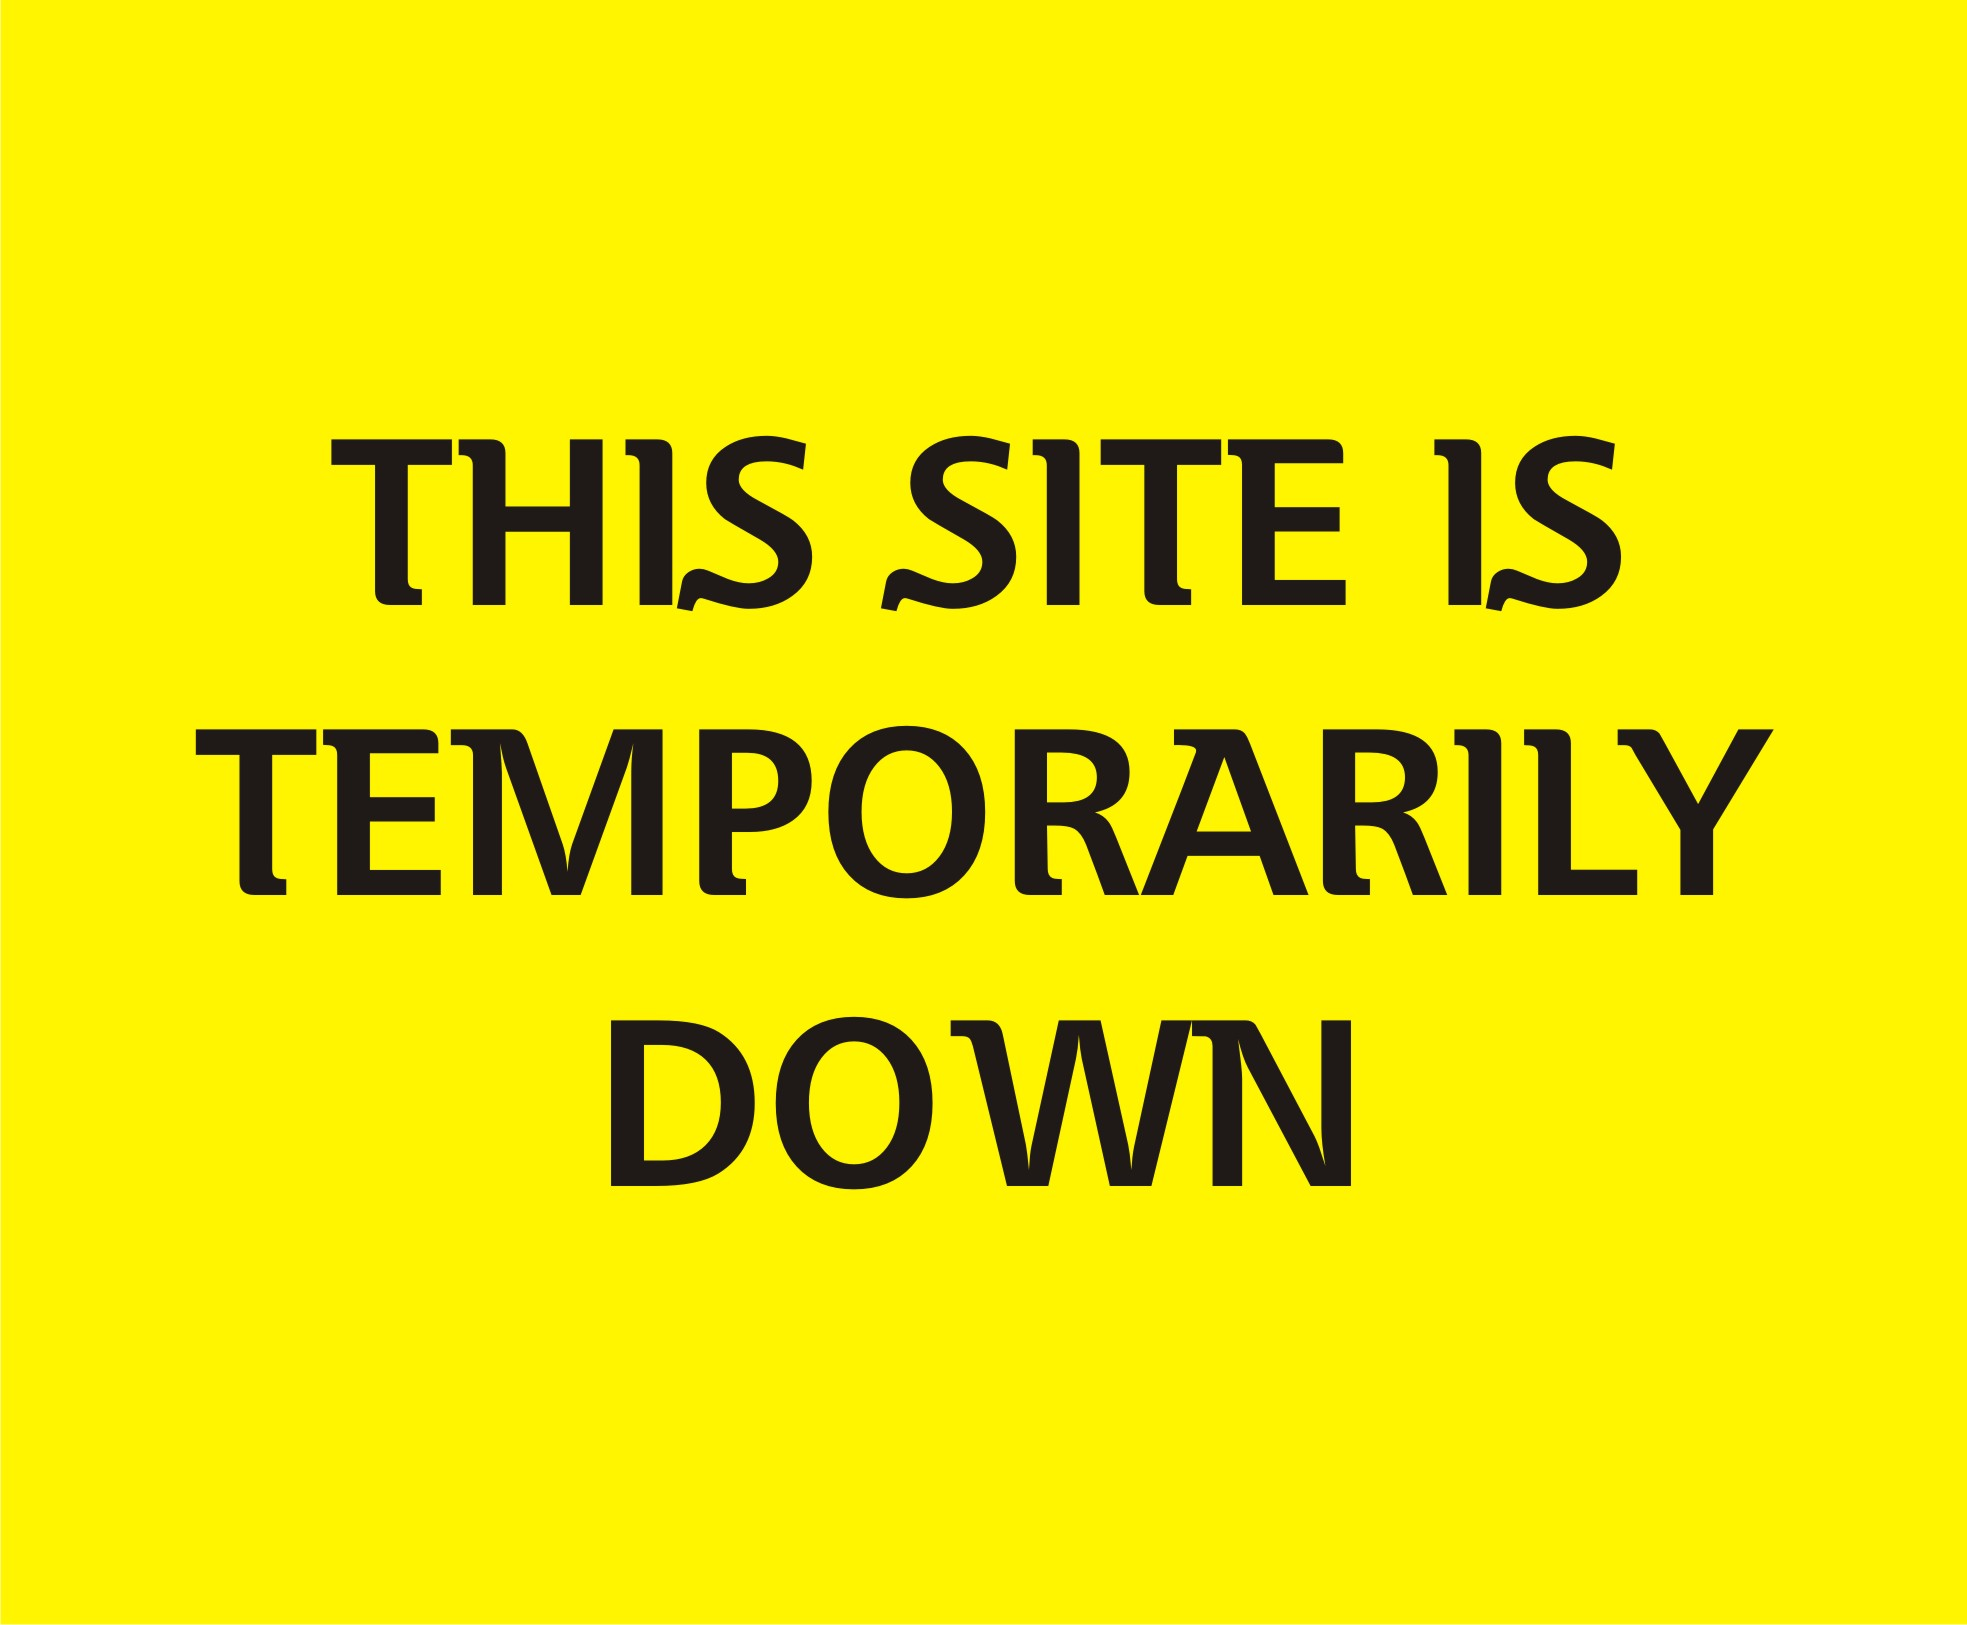 Site down